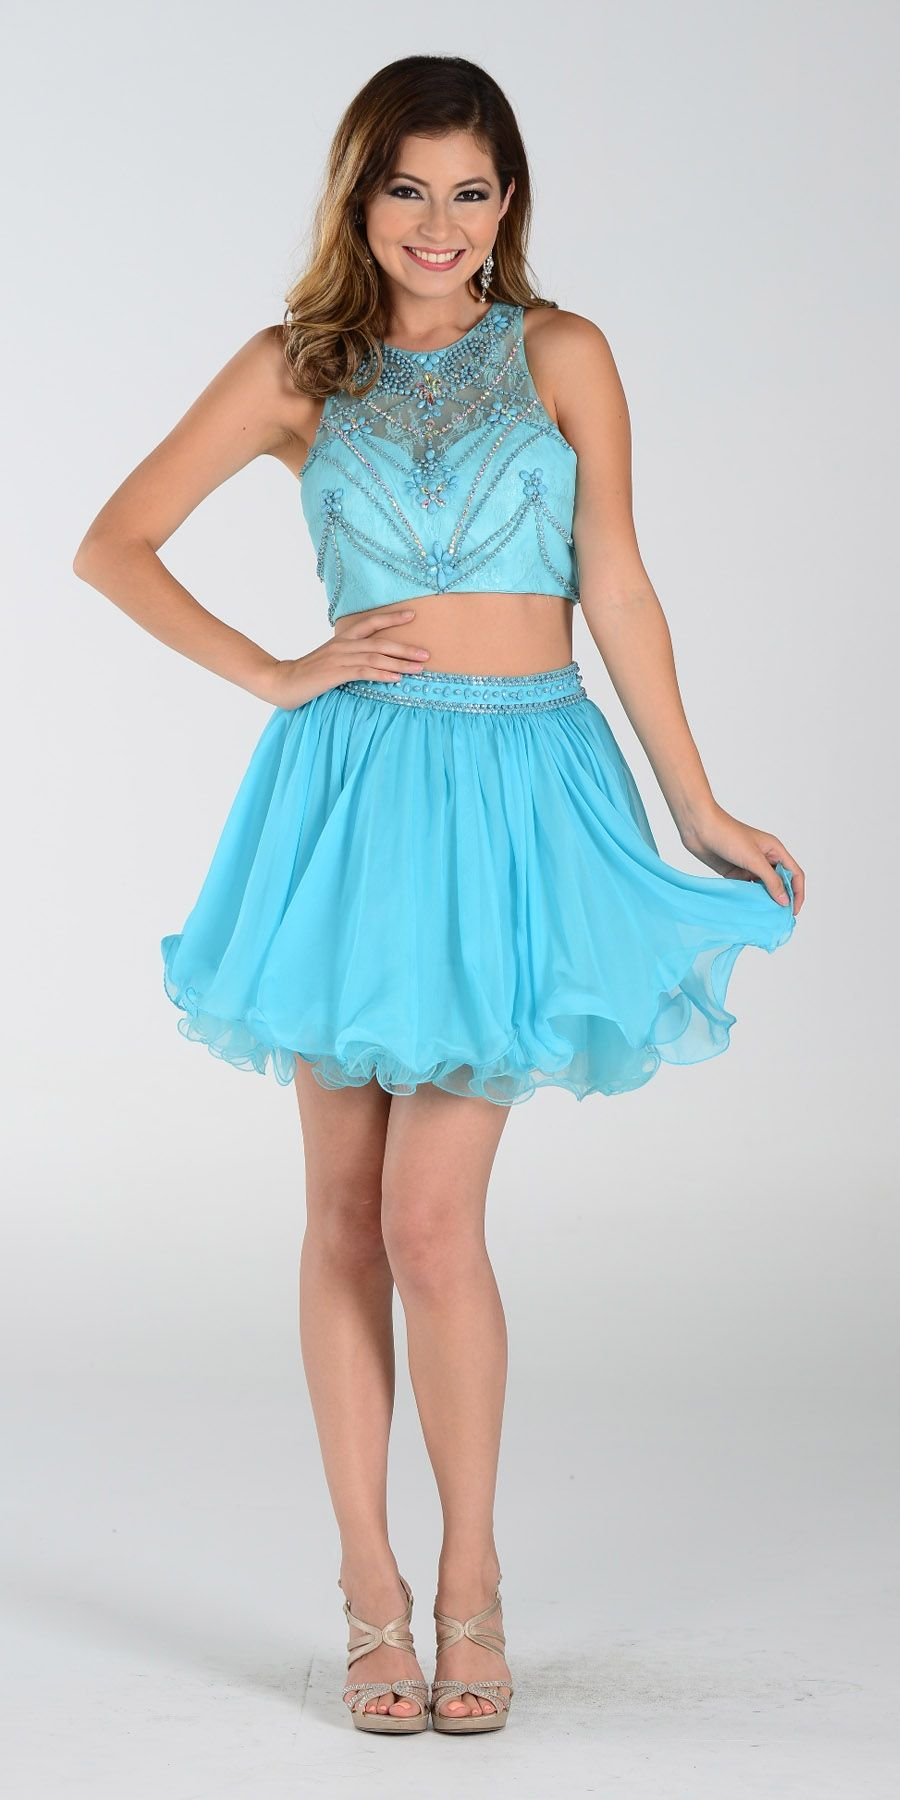 Poly USA 7416 Short 2 Piece Prom Dress Aqua Chiffon Skirt | Aqua ...